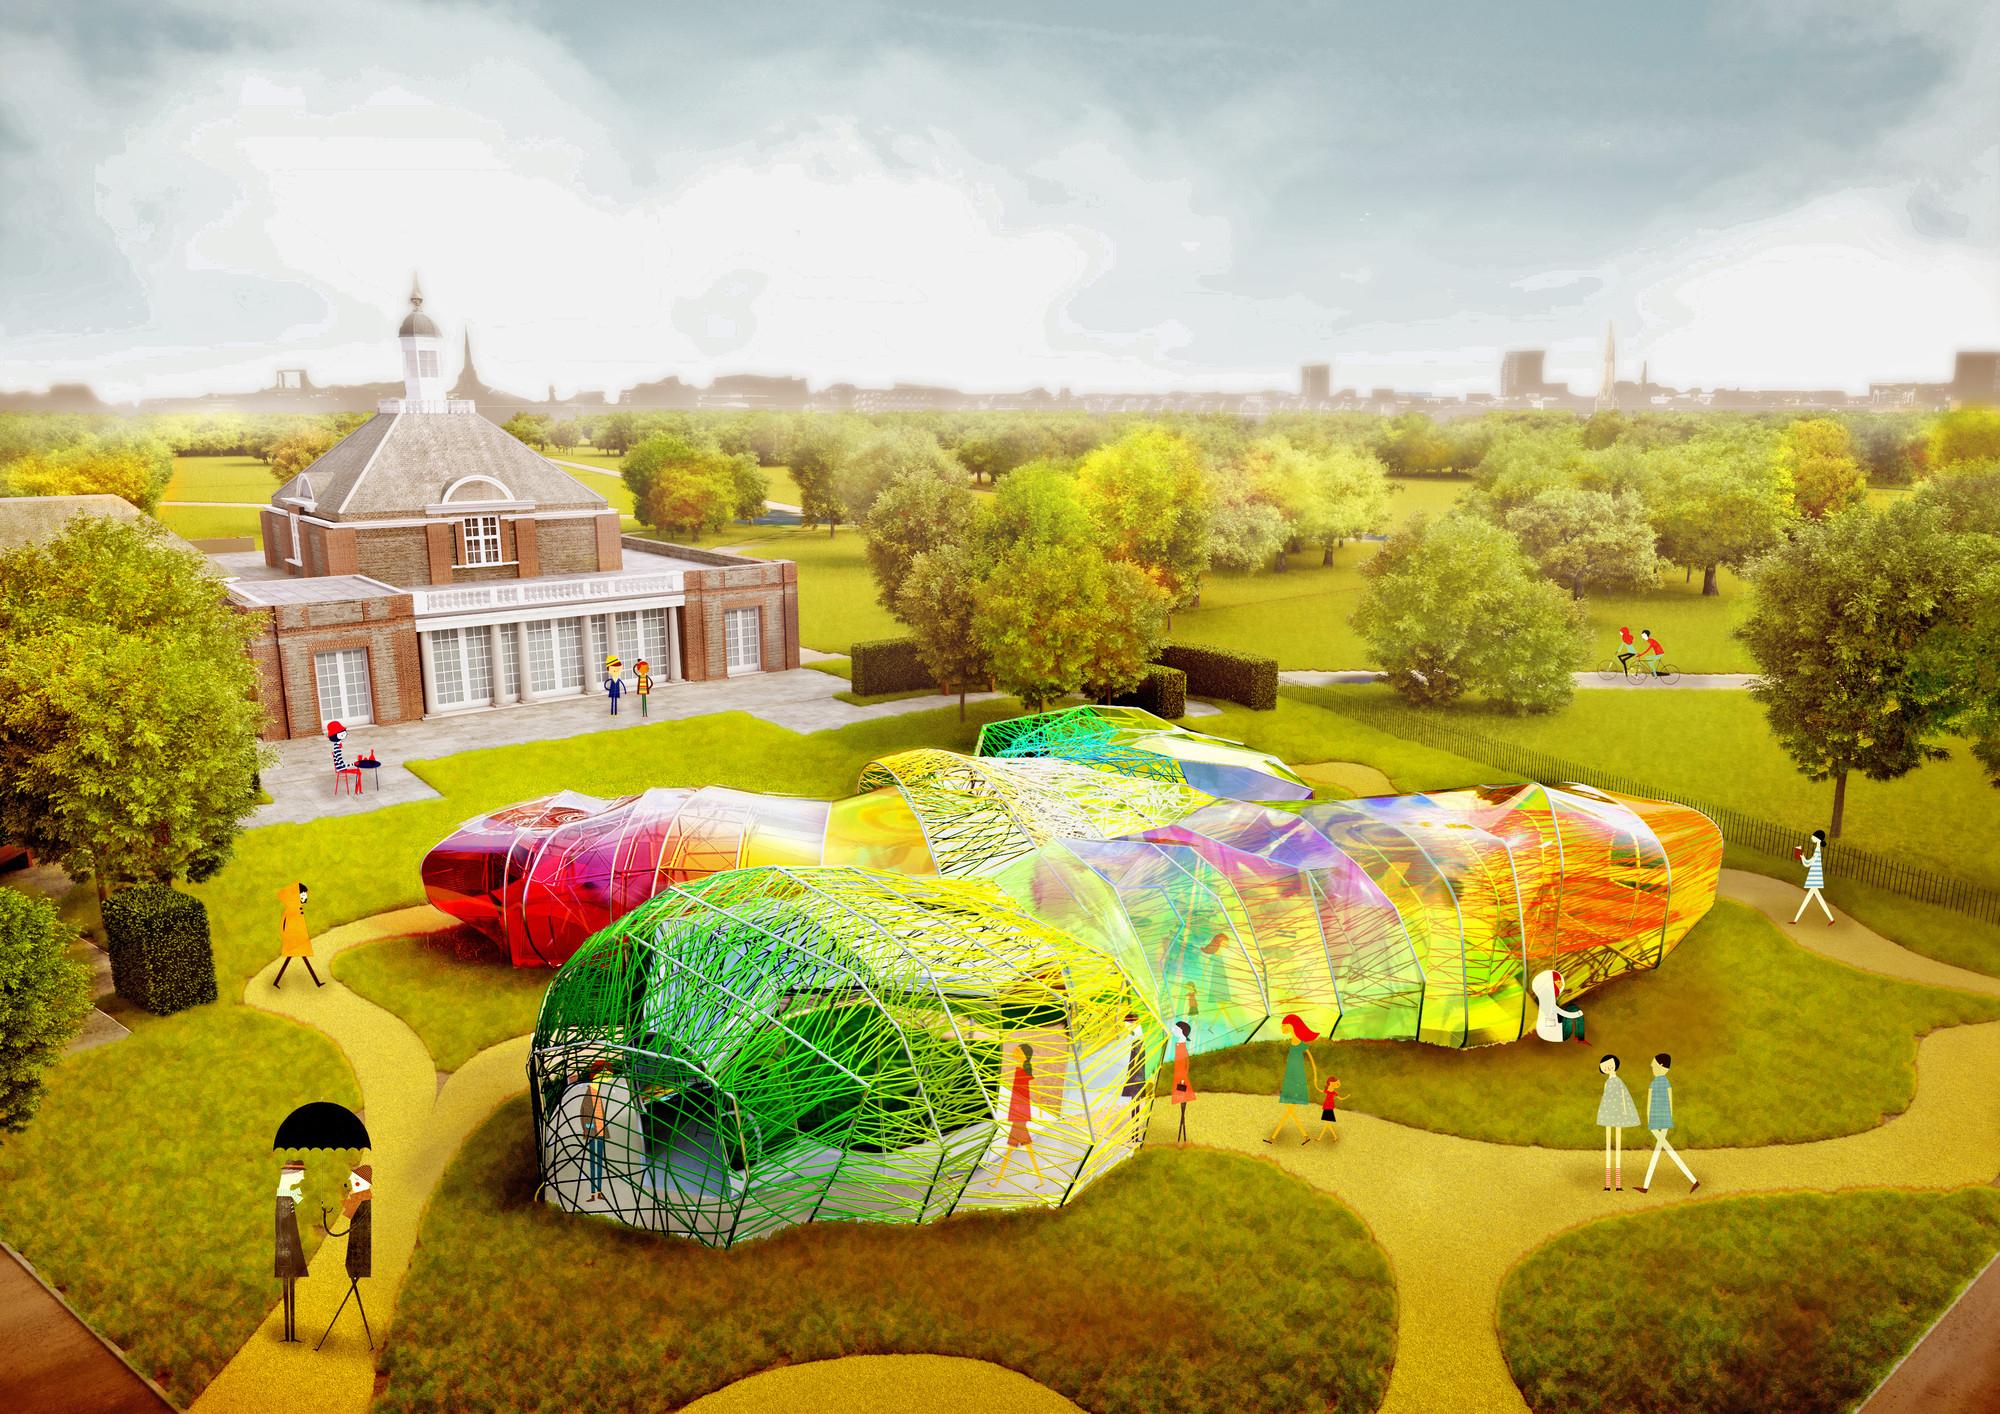 Serpentine Gallery presenta colorido diseño de SelgasCano para su próximo Pabellón, Serpentine Pavilion diseñado por SelgasCano 2015: vista diurna. Imagen © Steven Kevin Howson / SelgasCano